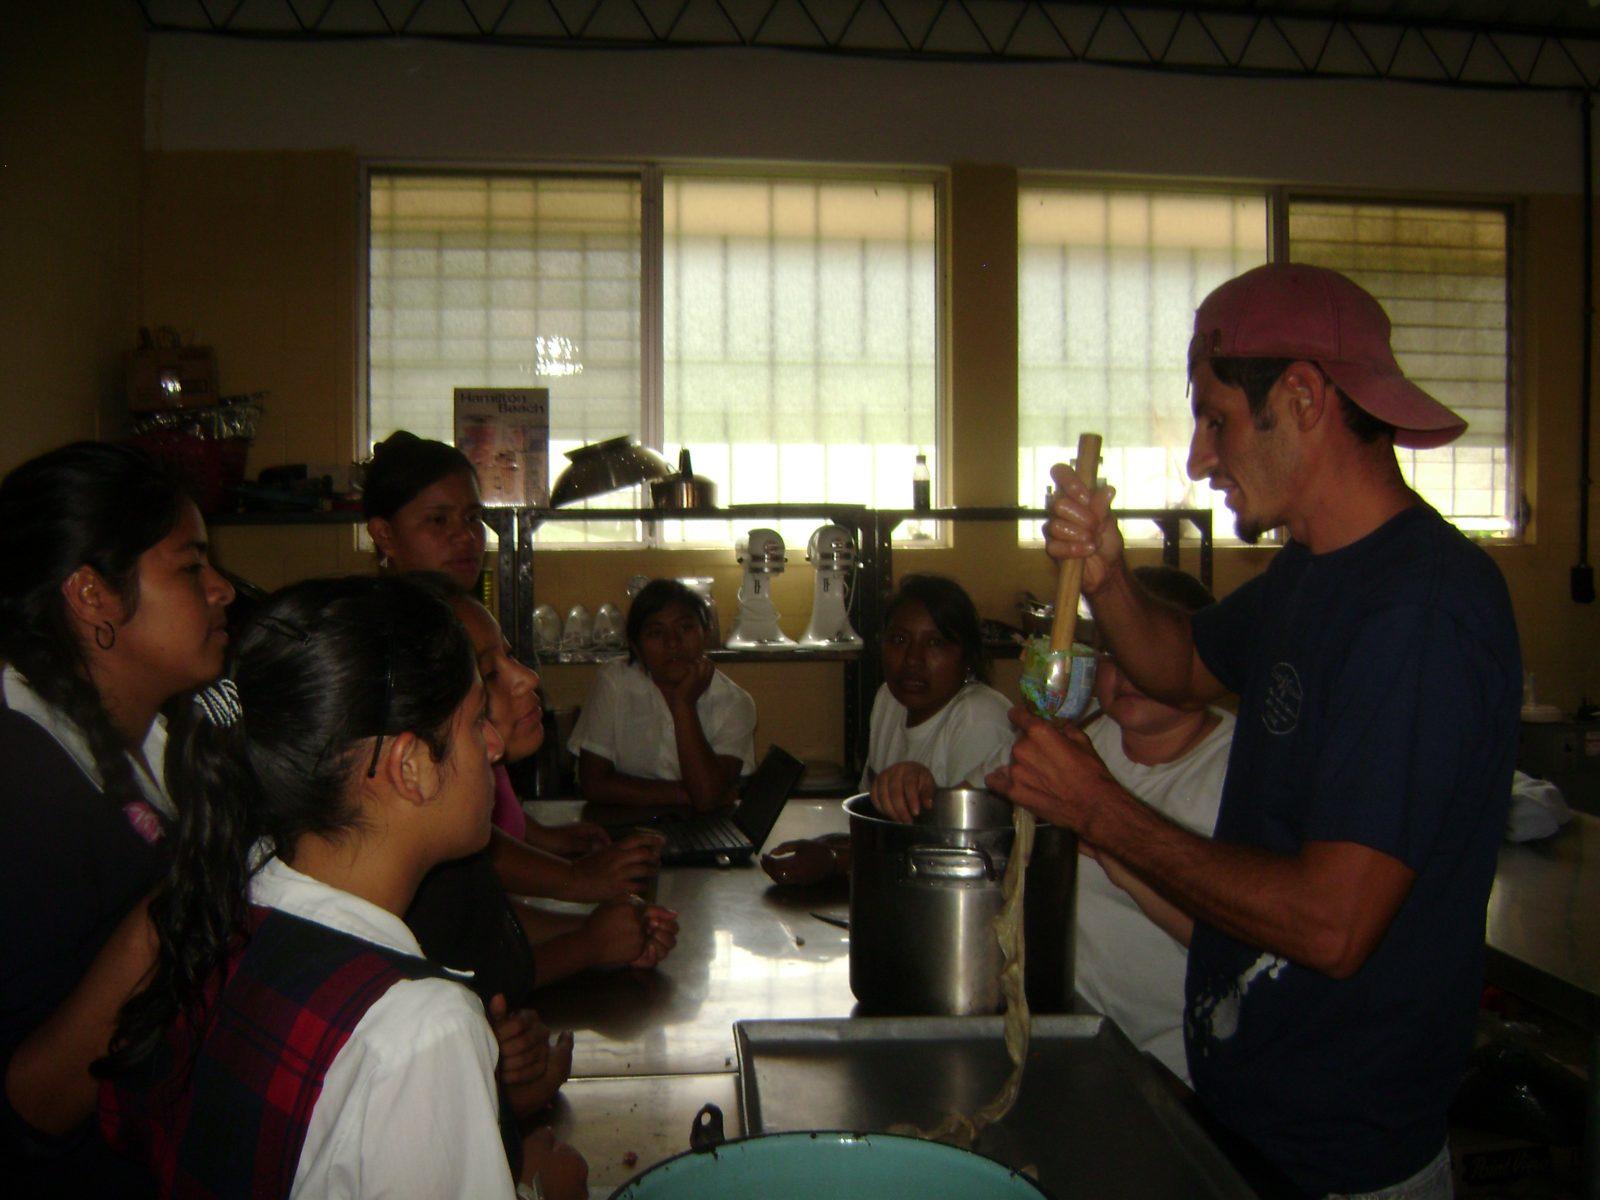 Showing how to stuff chorizo sausage